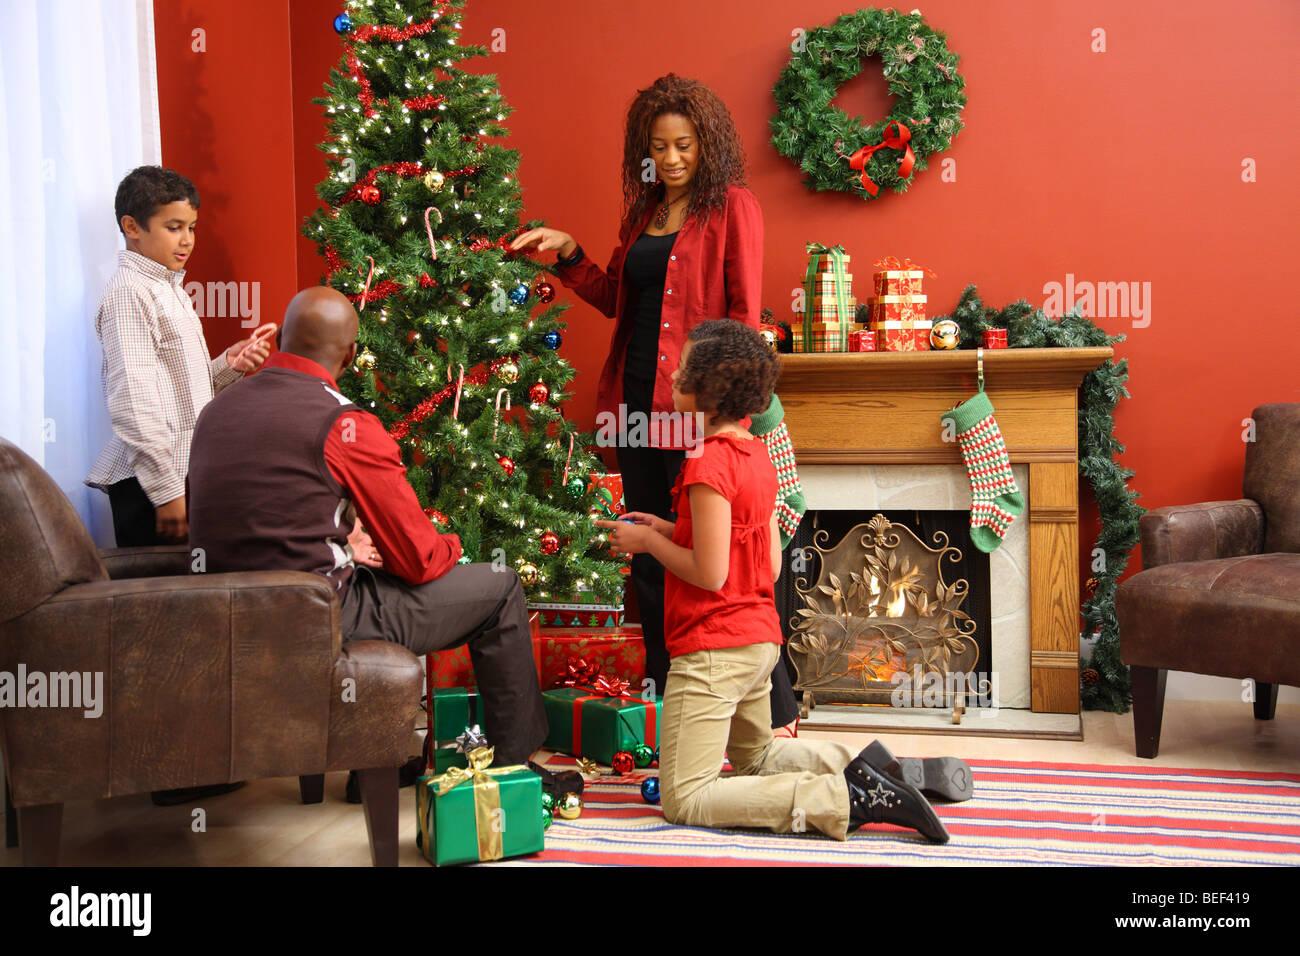 Family decorating Christmas tree - Stock Image